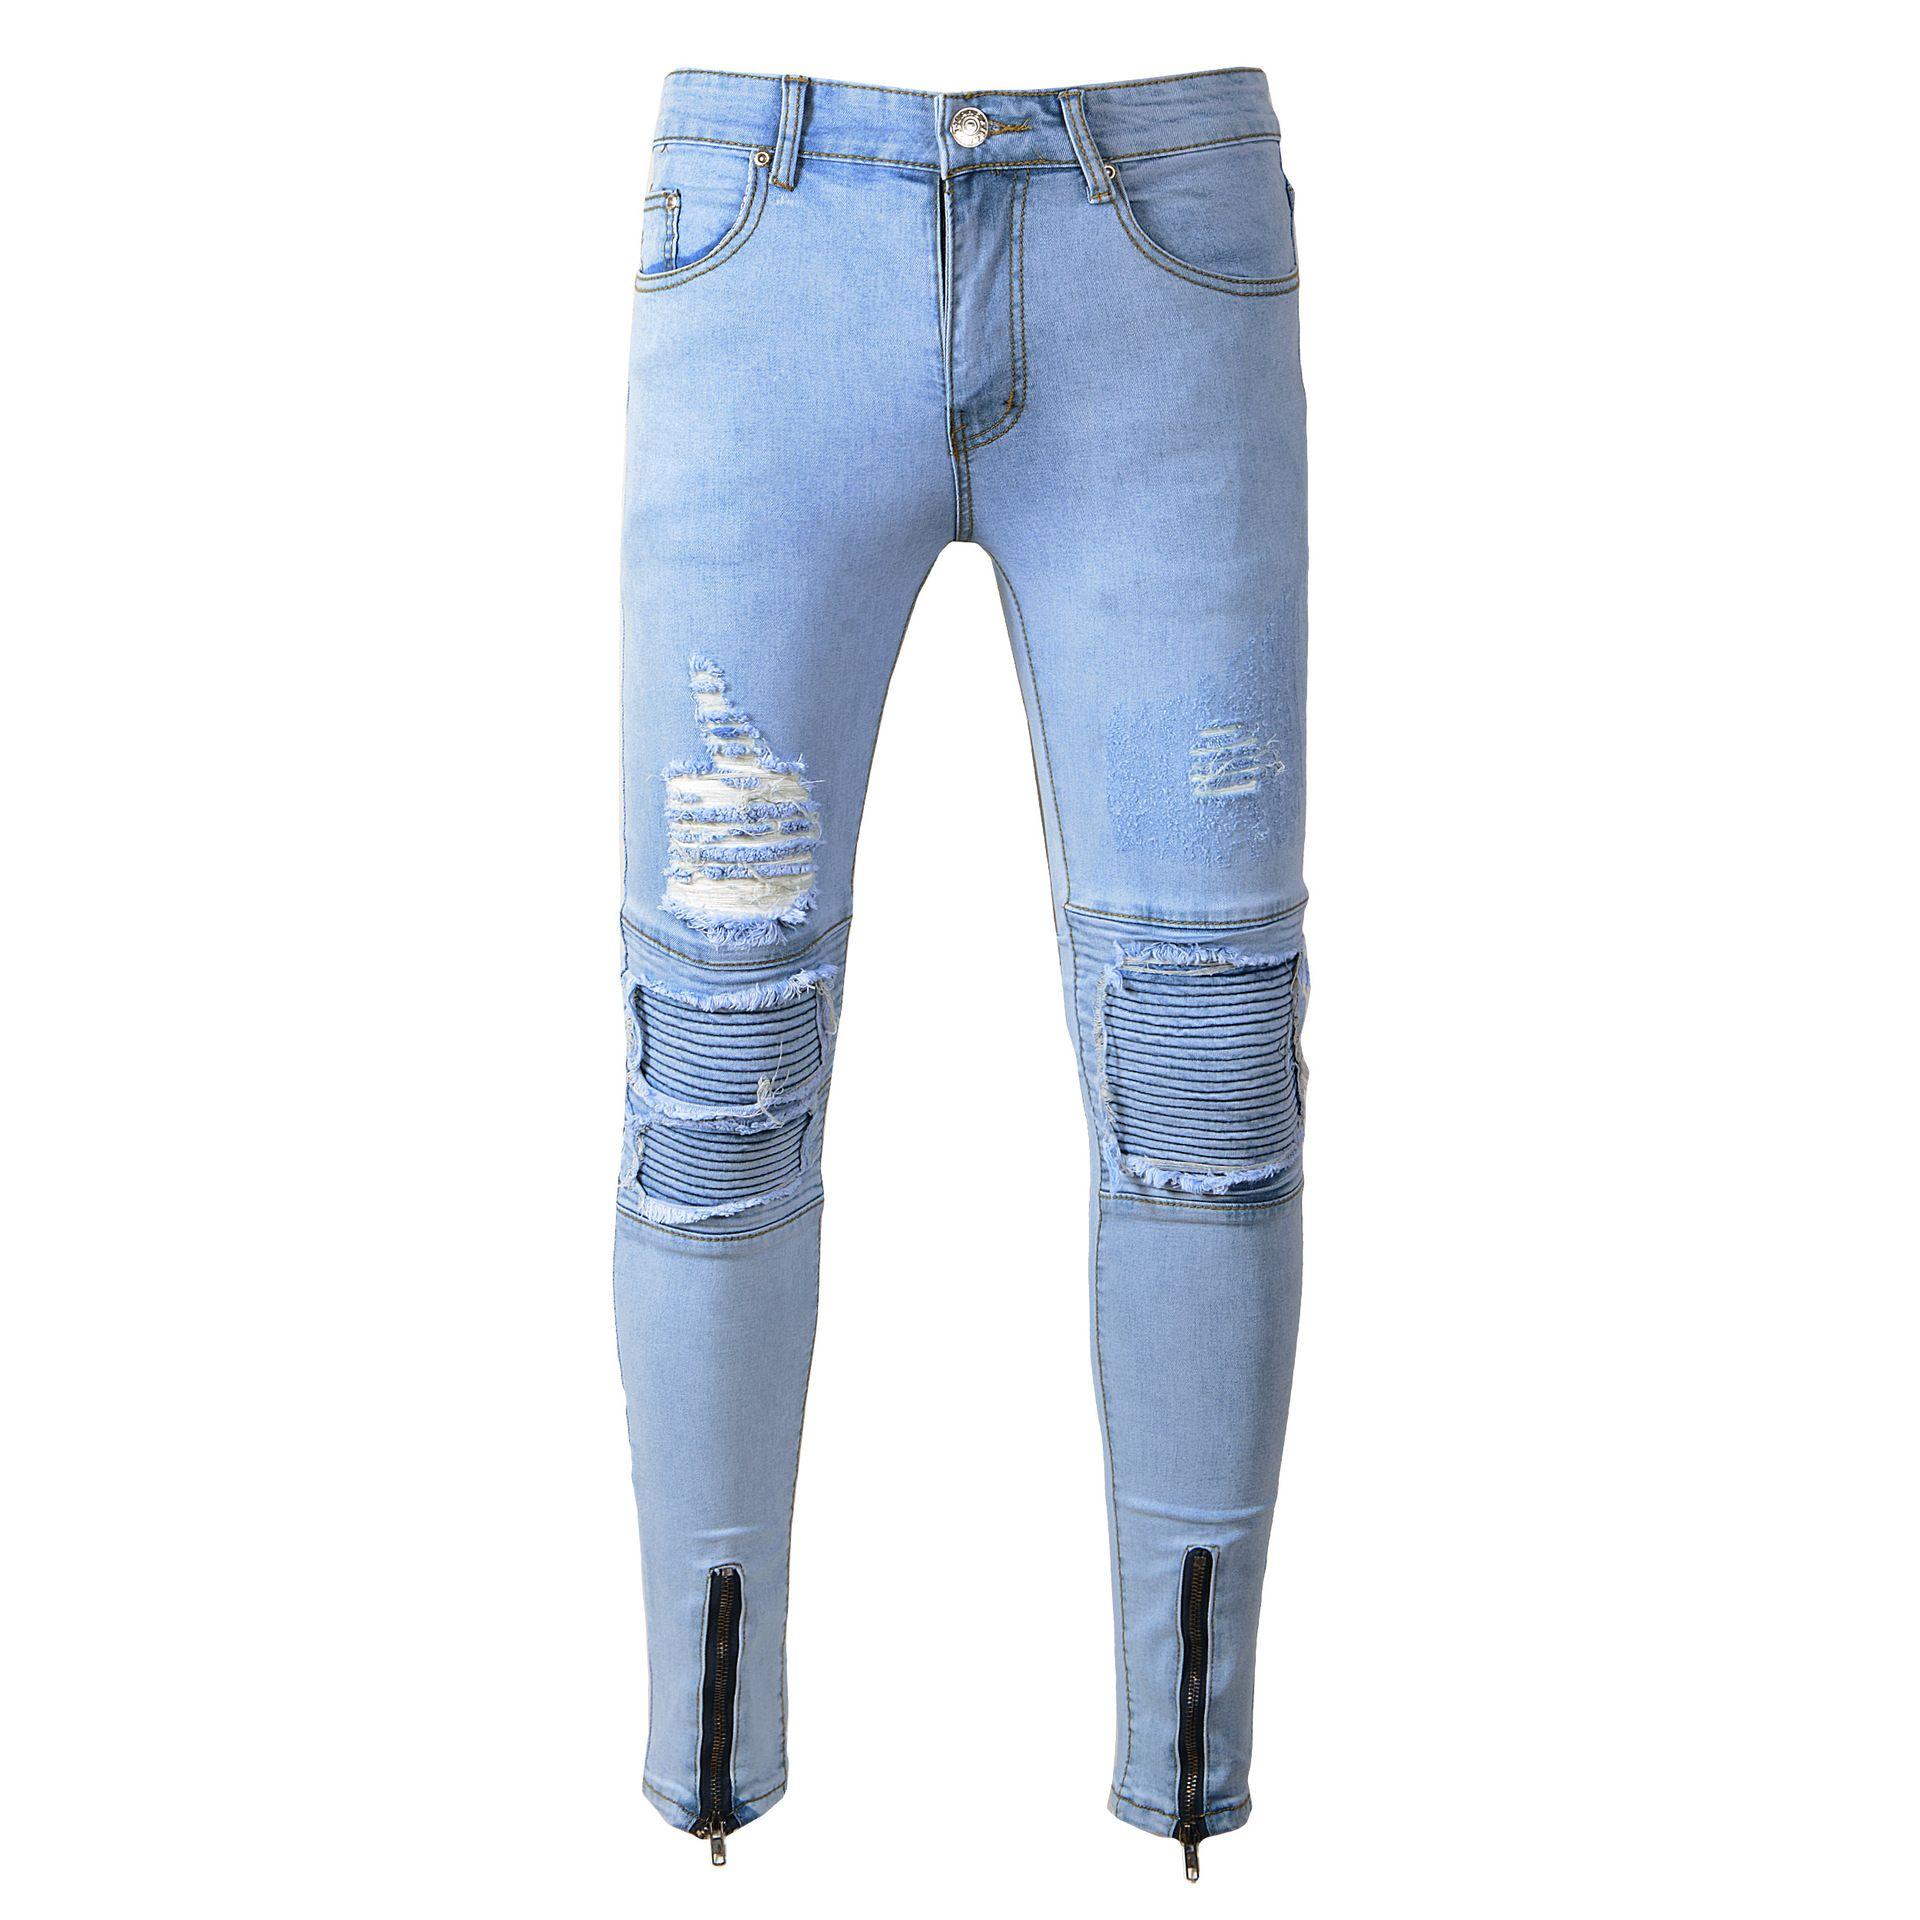 f18d0b65960 Fashion Mens Straight Slim Fit Hole Biker Jeans Light -Colored Washed  Pencil Pants Ripped Destroyed Denim Jeans Hip Hop Streetwear Blue Hole  Biker Jeans ...